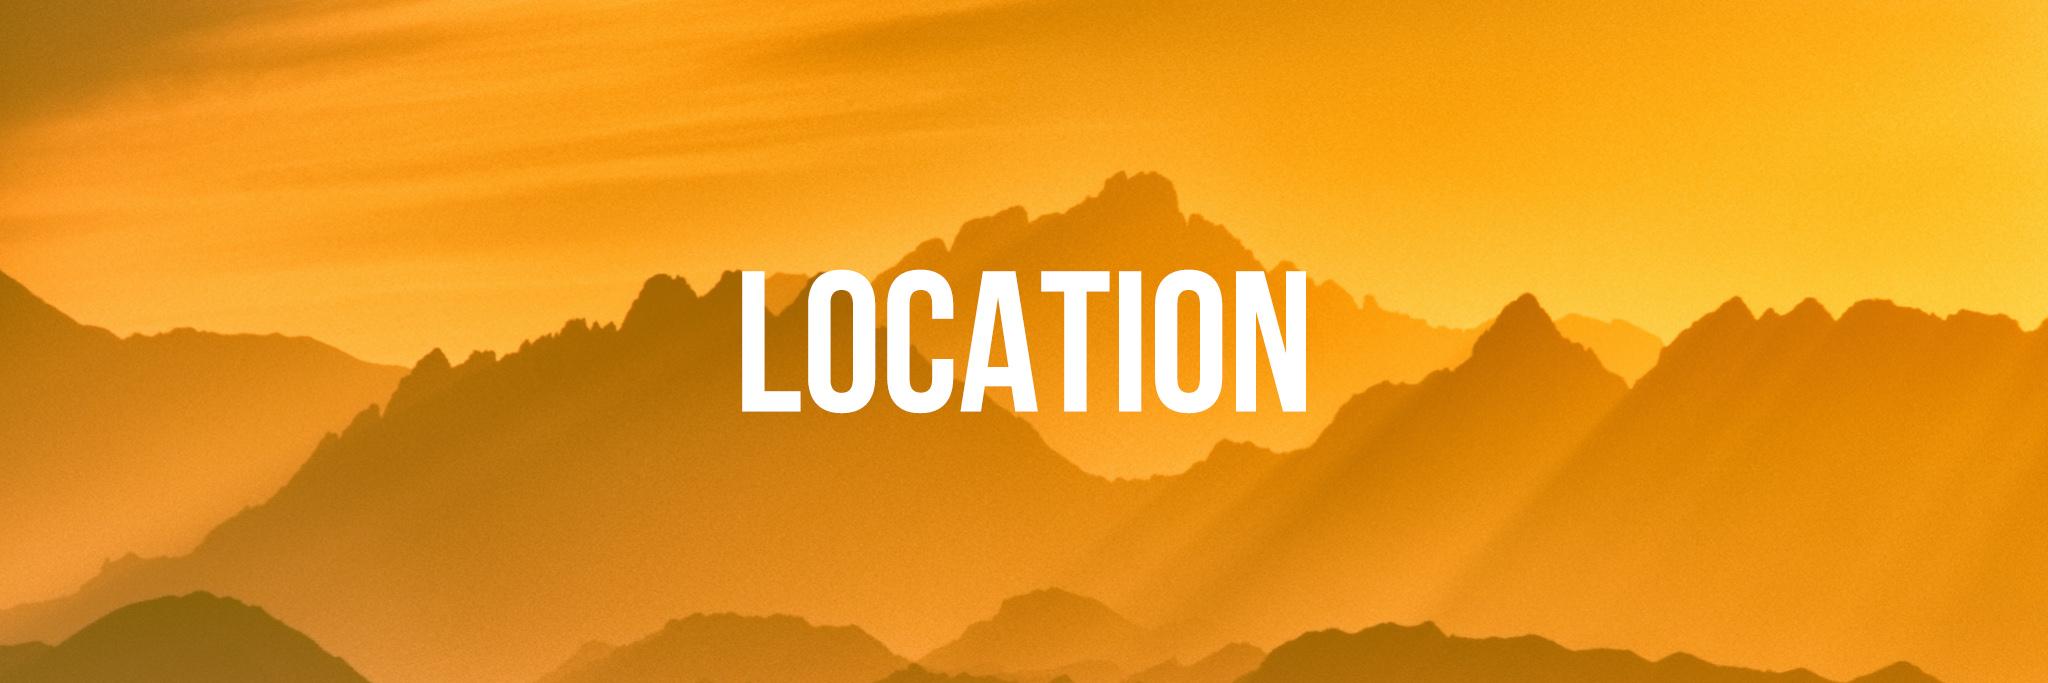 locations english.jpg